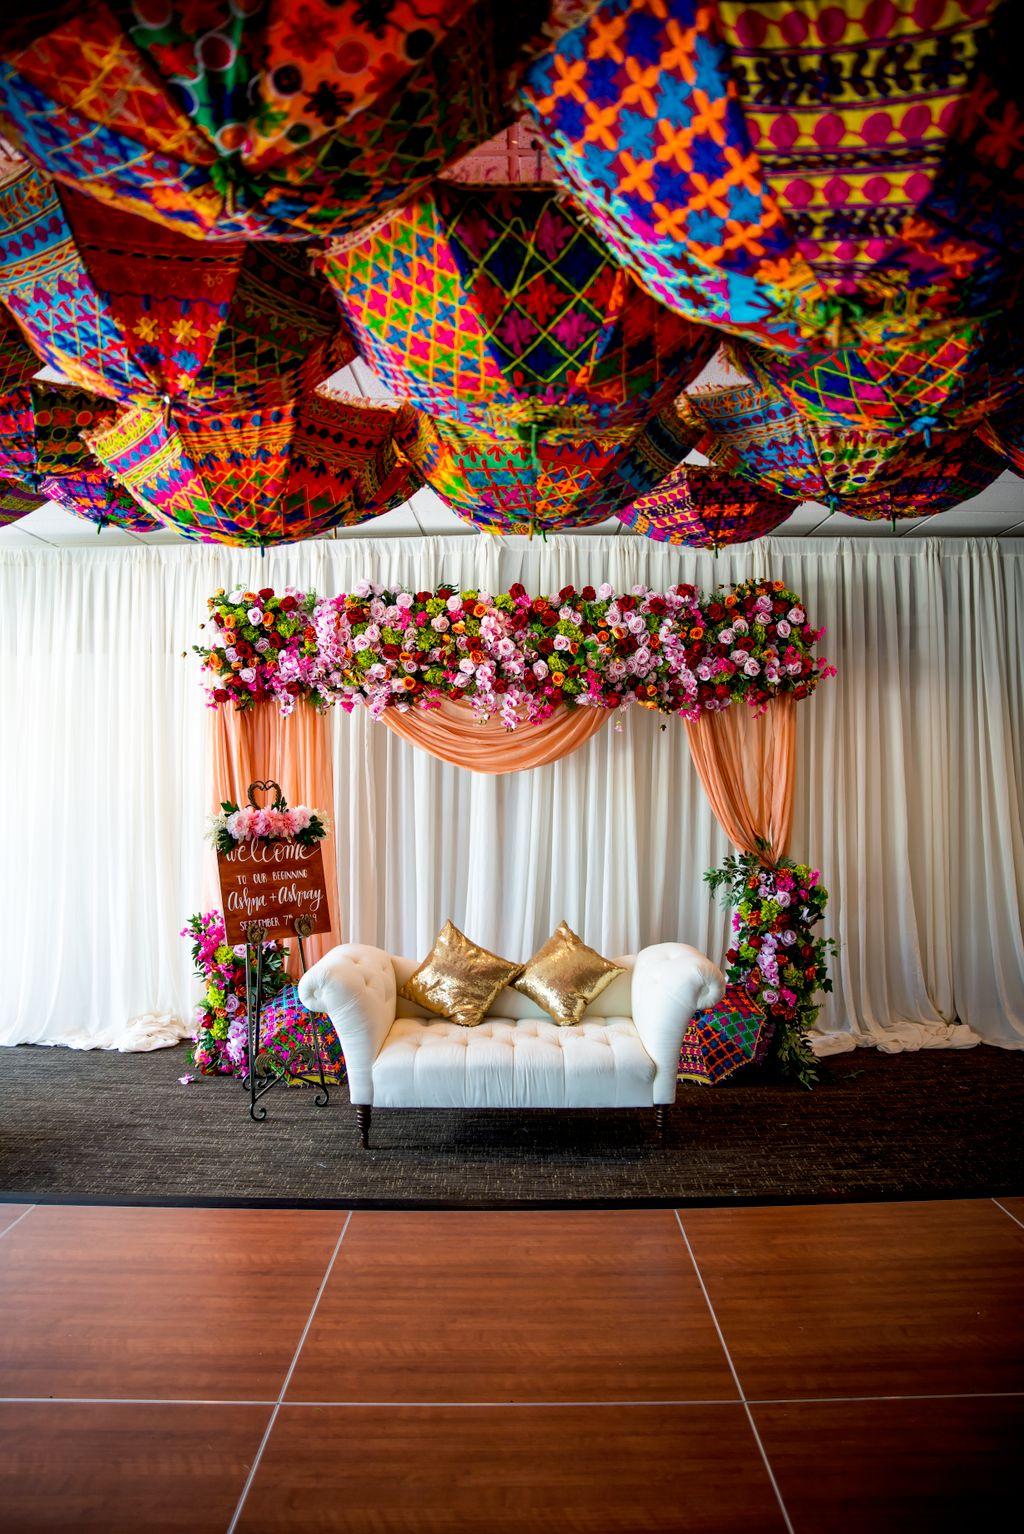 Ashna & Ashray's Engagement